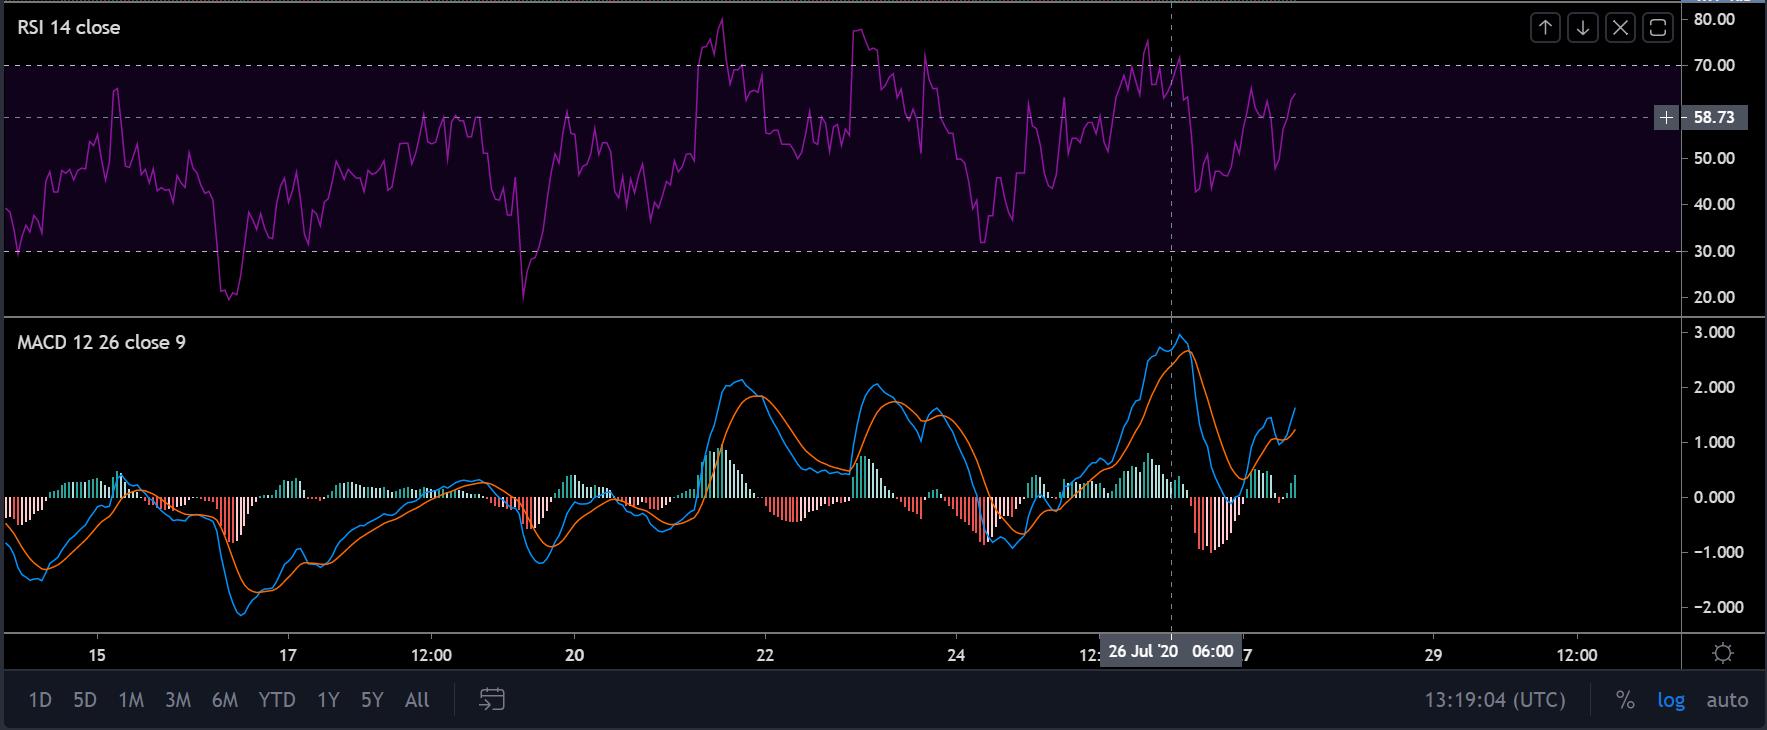 Análisis de precios a corto plazo de Bitcoin SV: 27 de julio